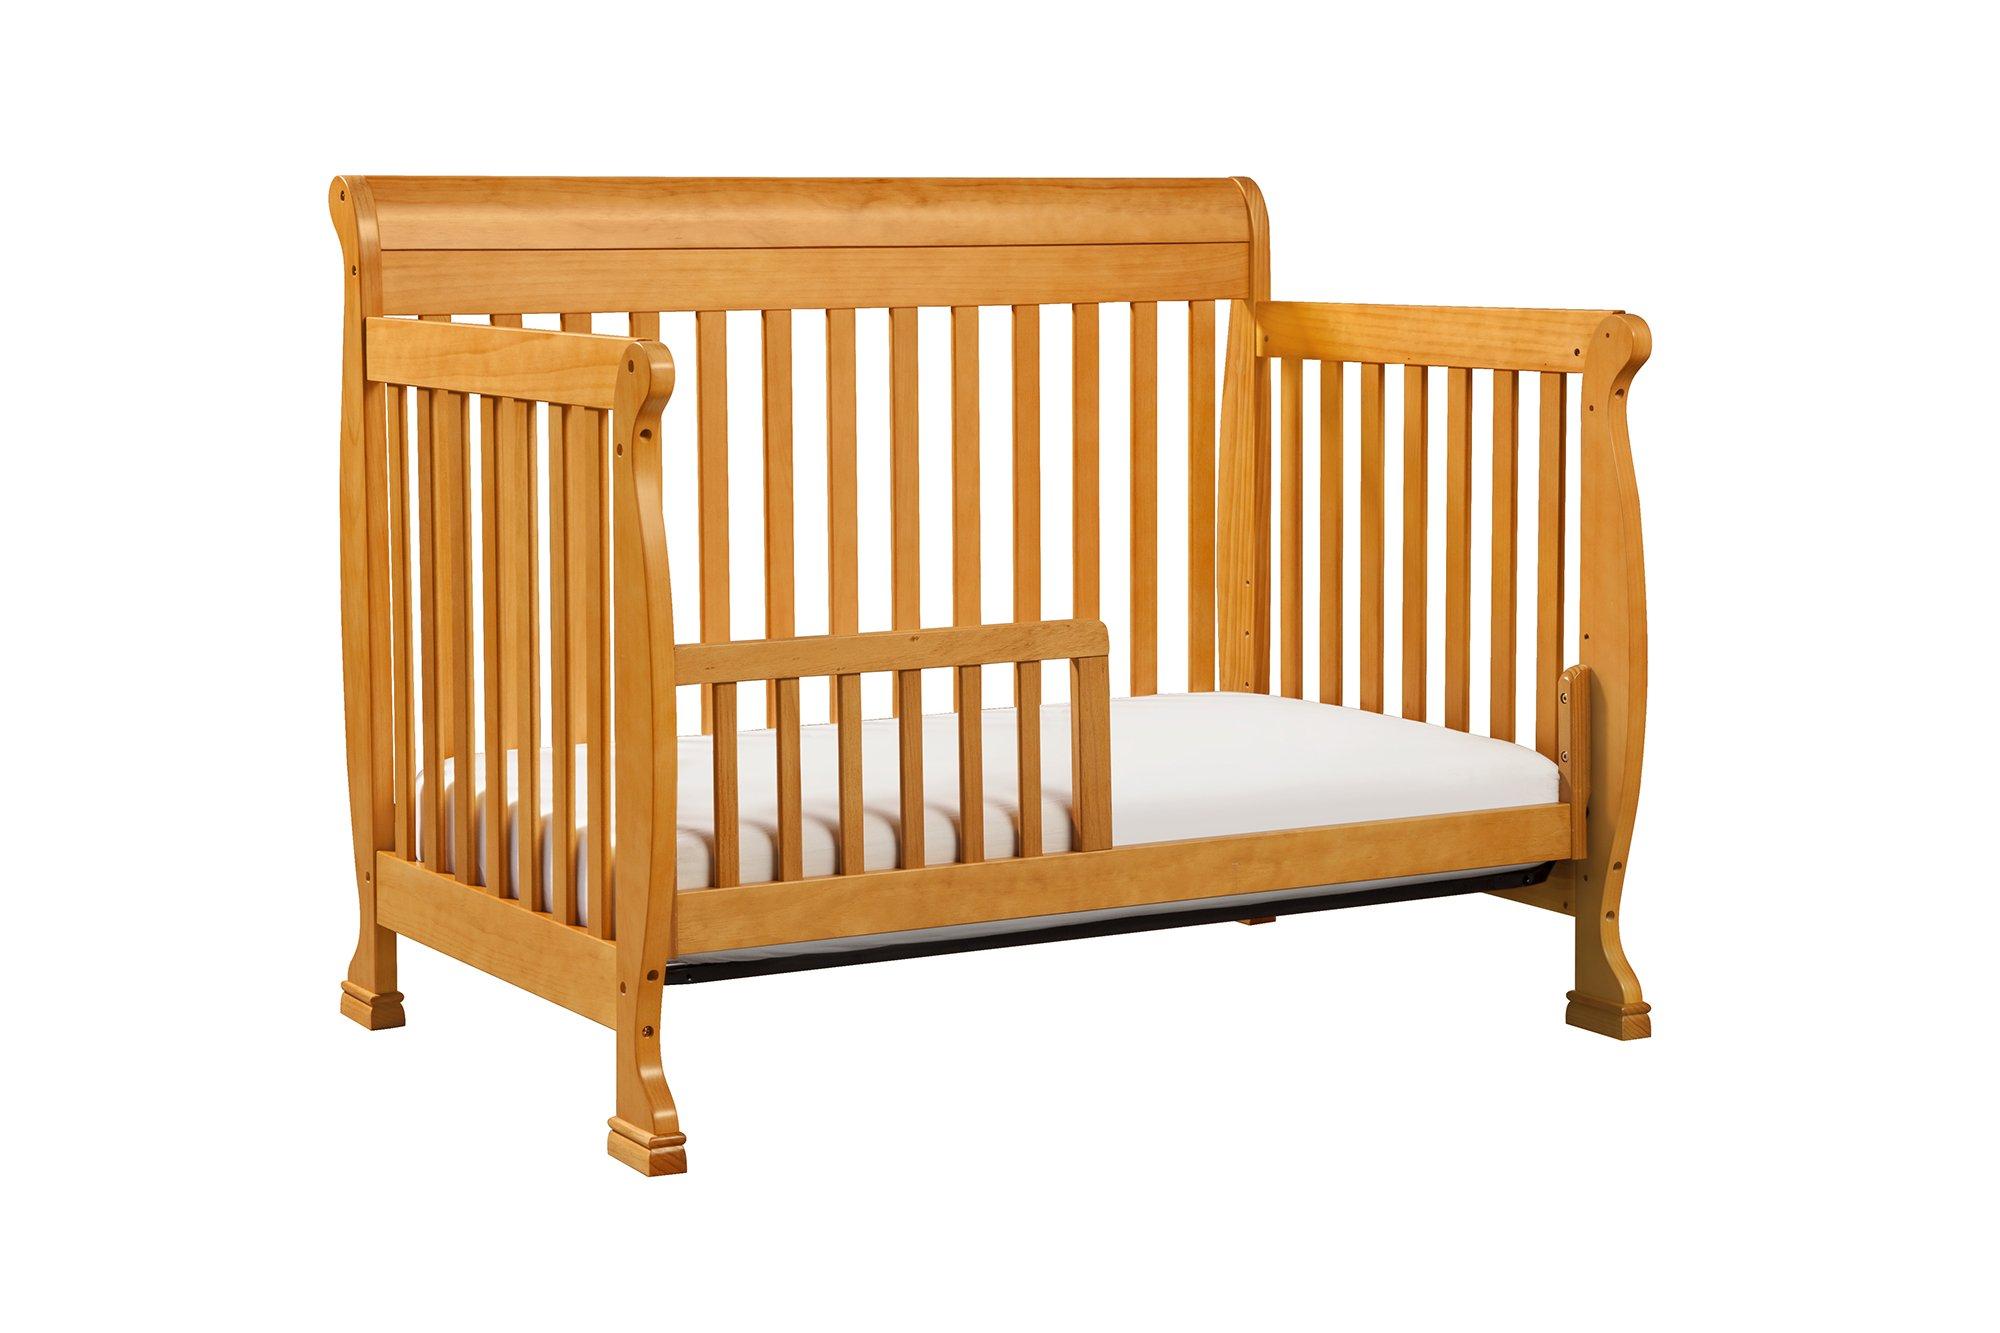 DaVinci Kalani 4-In-1 Convertible Crib, Honey Oak by DaVinci (Image #8)